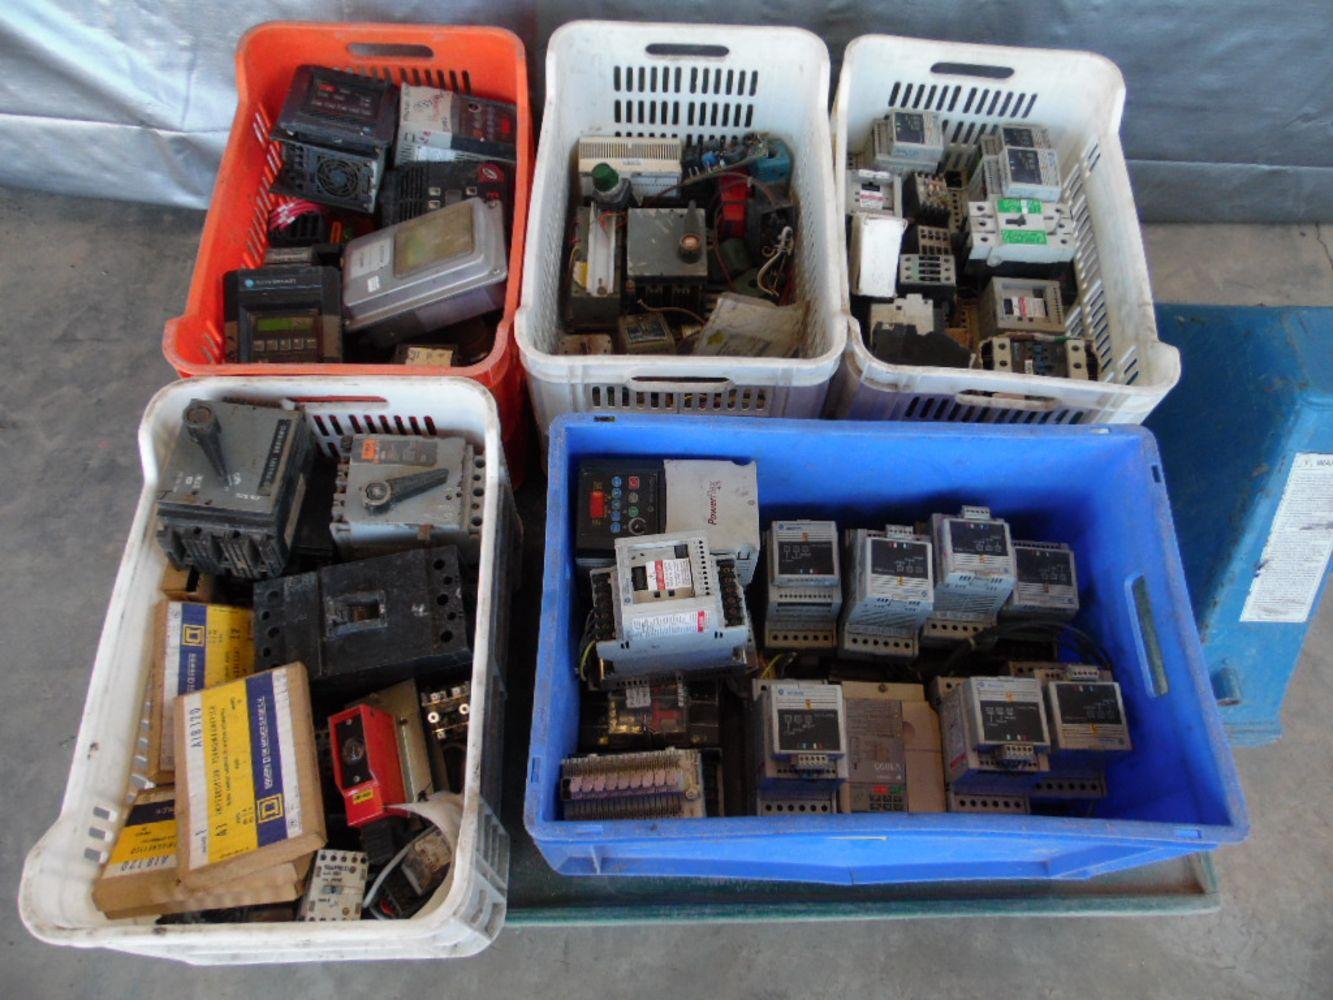 Metalworking and Misc. Equipment Online Auction  - Gran Subasta Metal Mecanica e Equipos Misc.